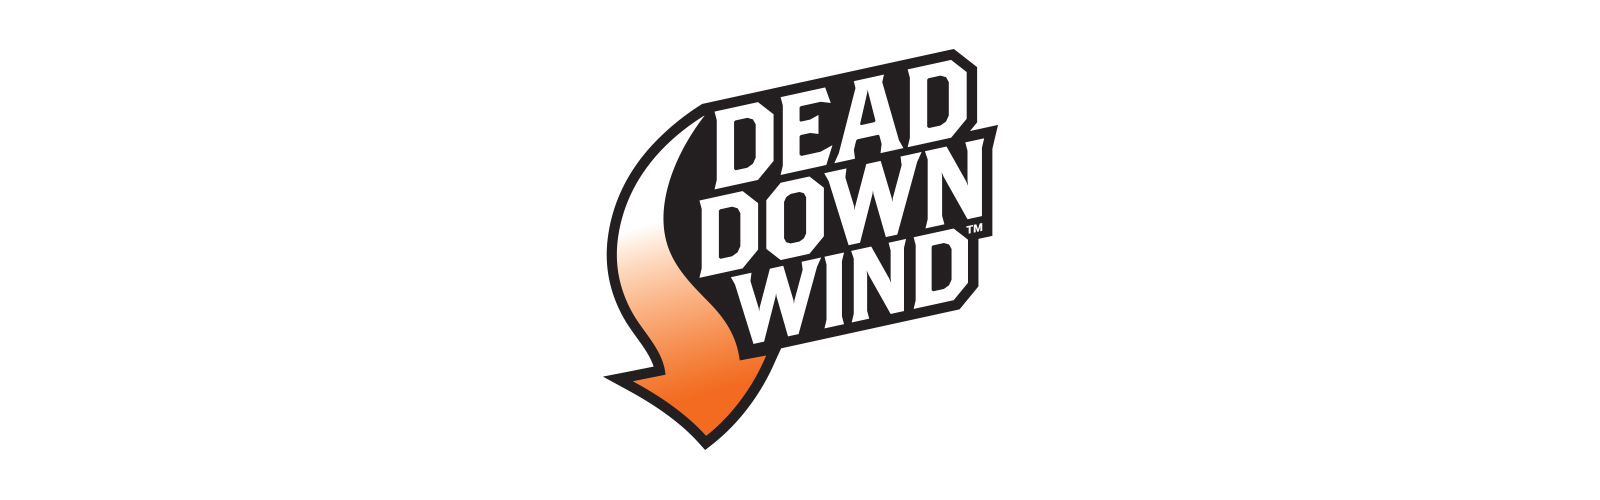 Dead Down Wind Turkey Season Edition